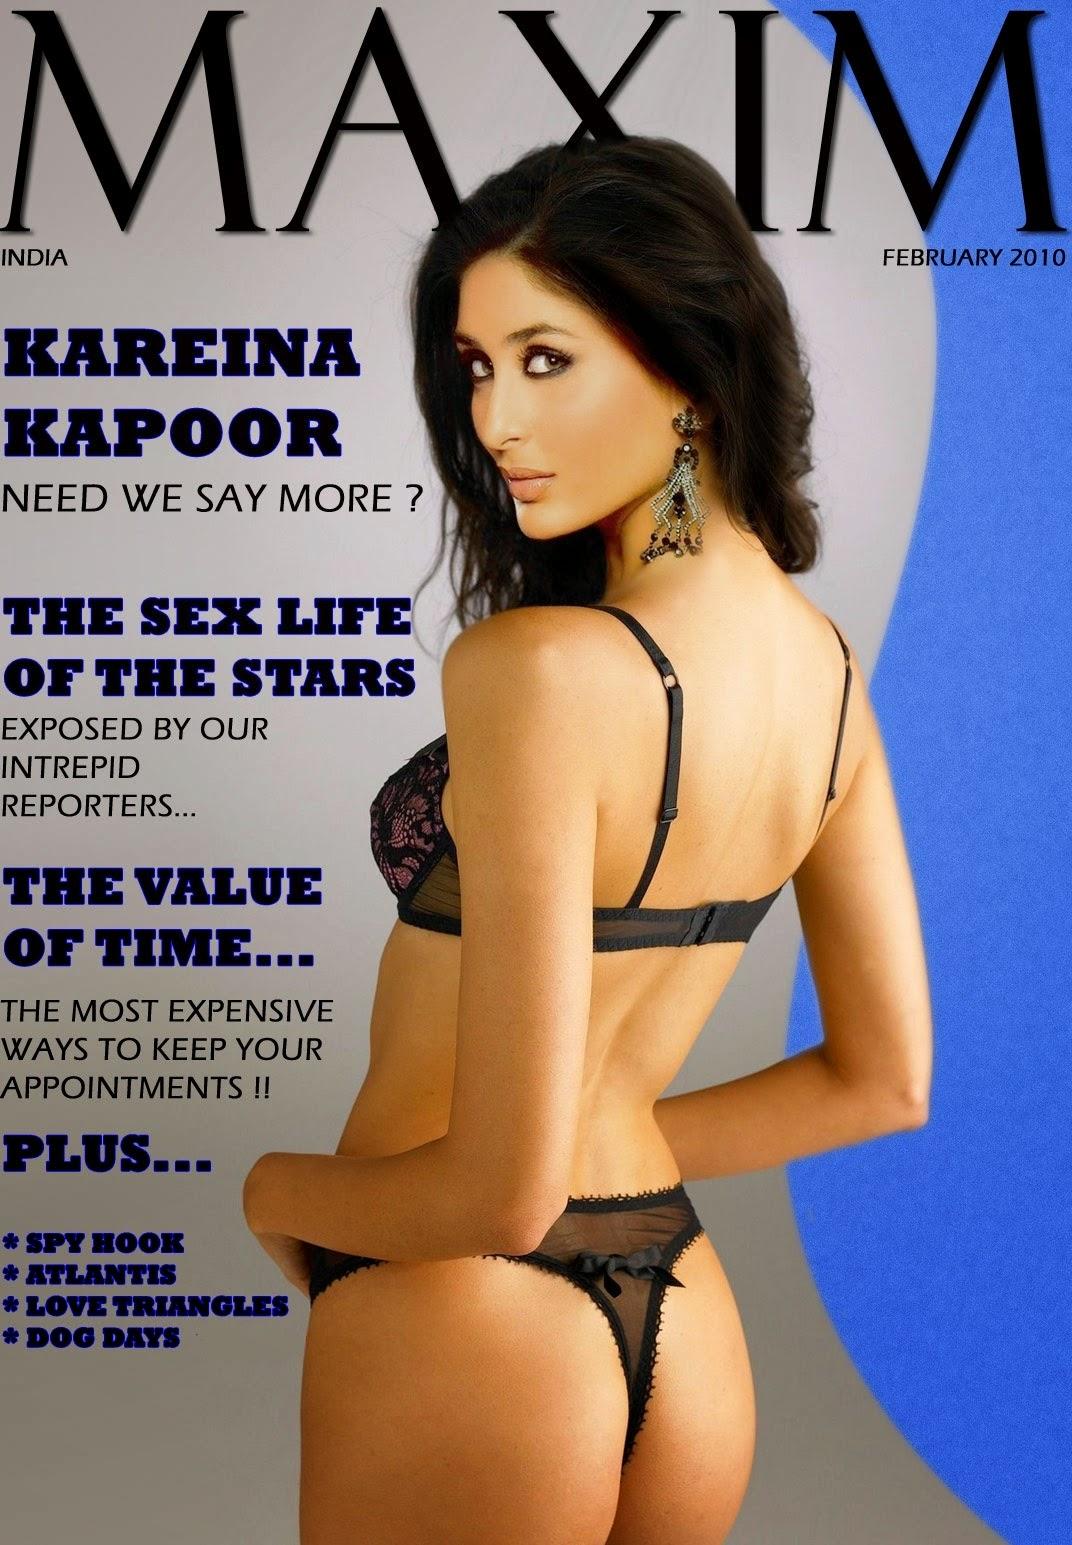 Kareena Kapoor Top Hottest Bikini Photos And Tight Sexy -4506